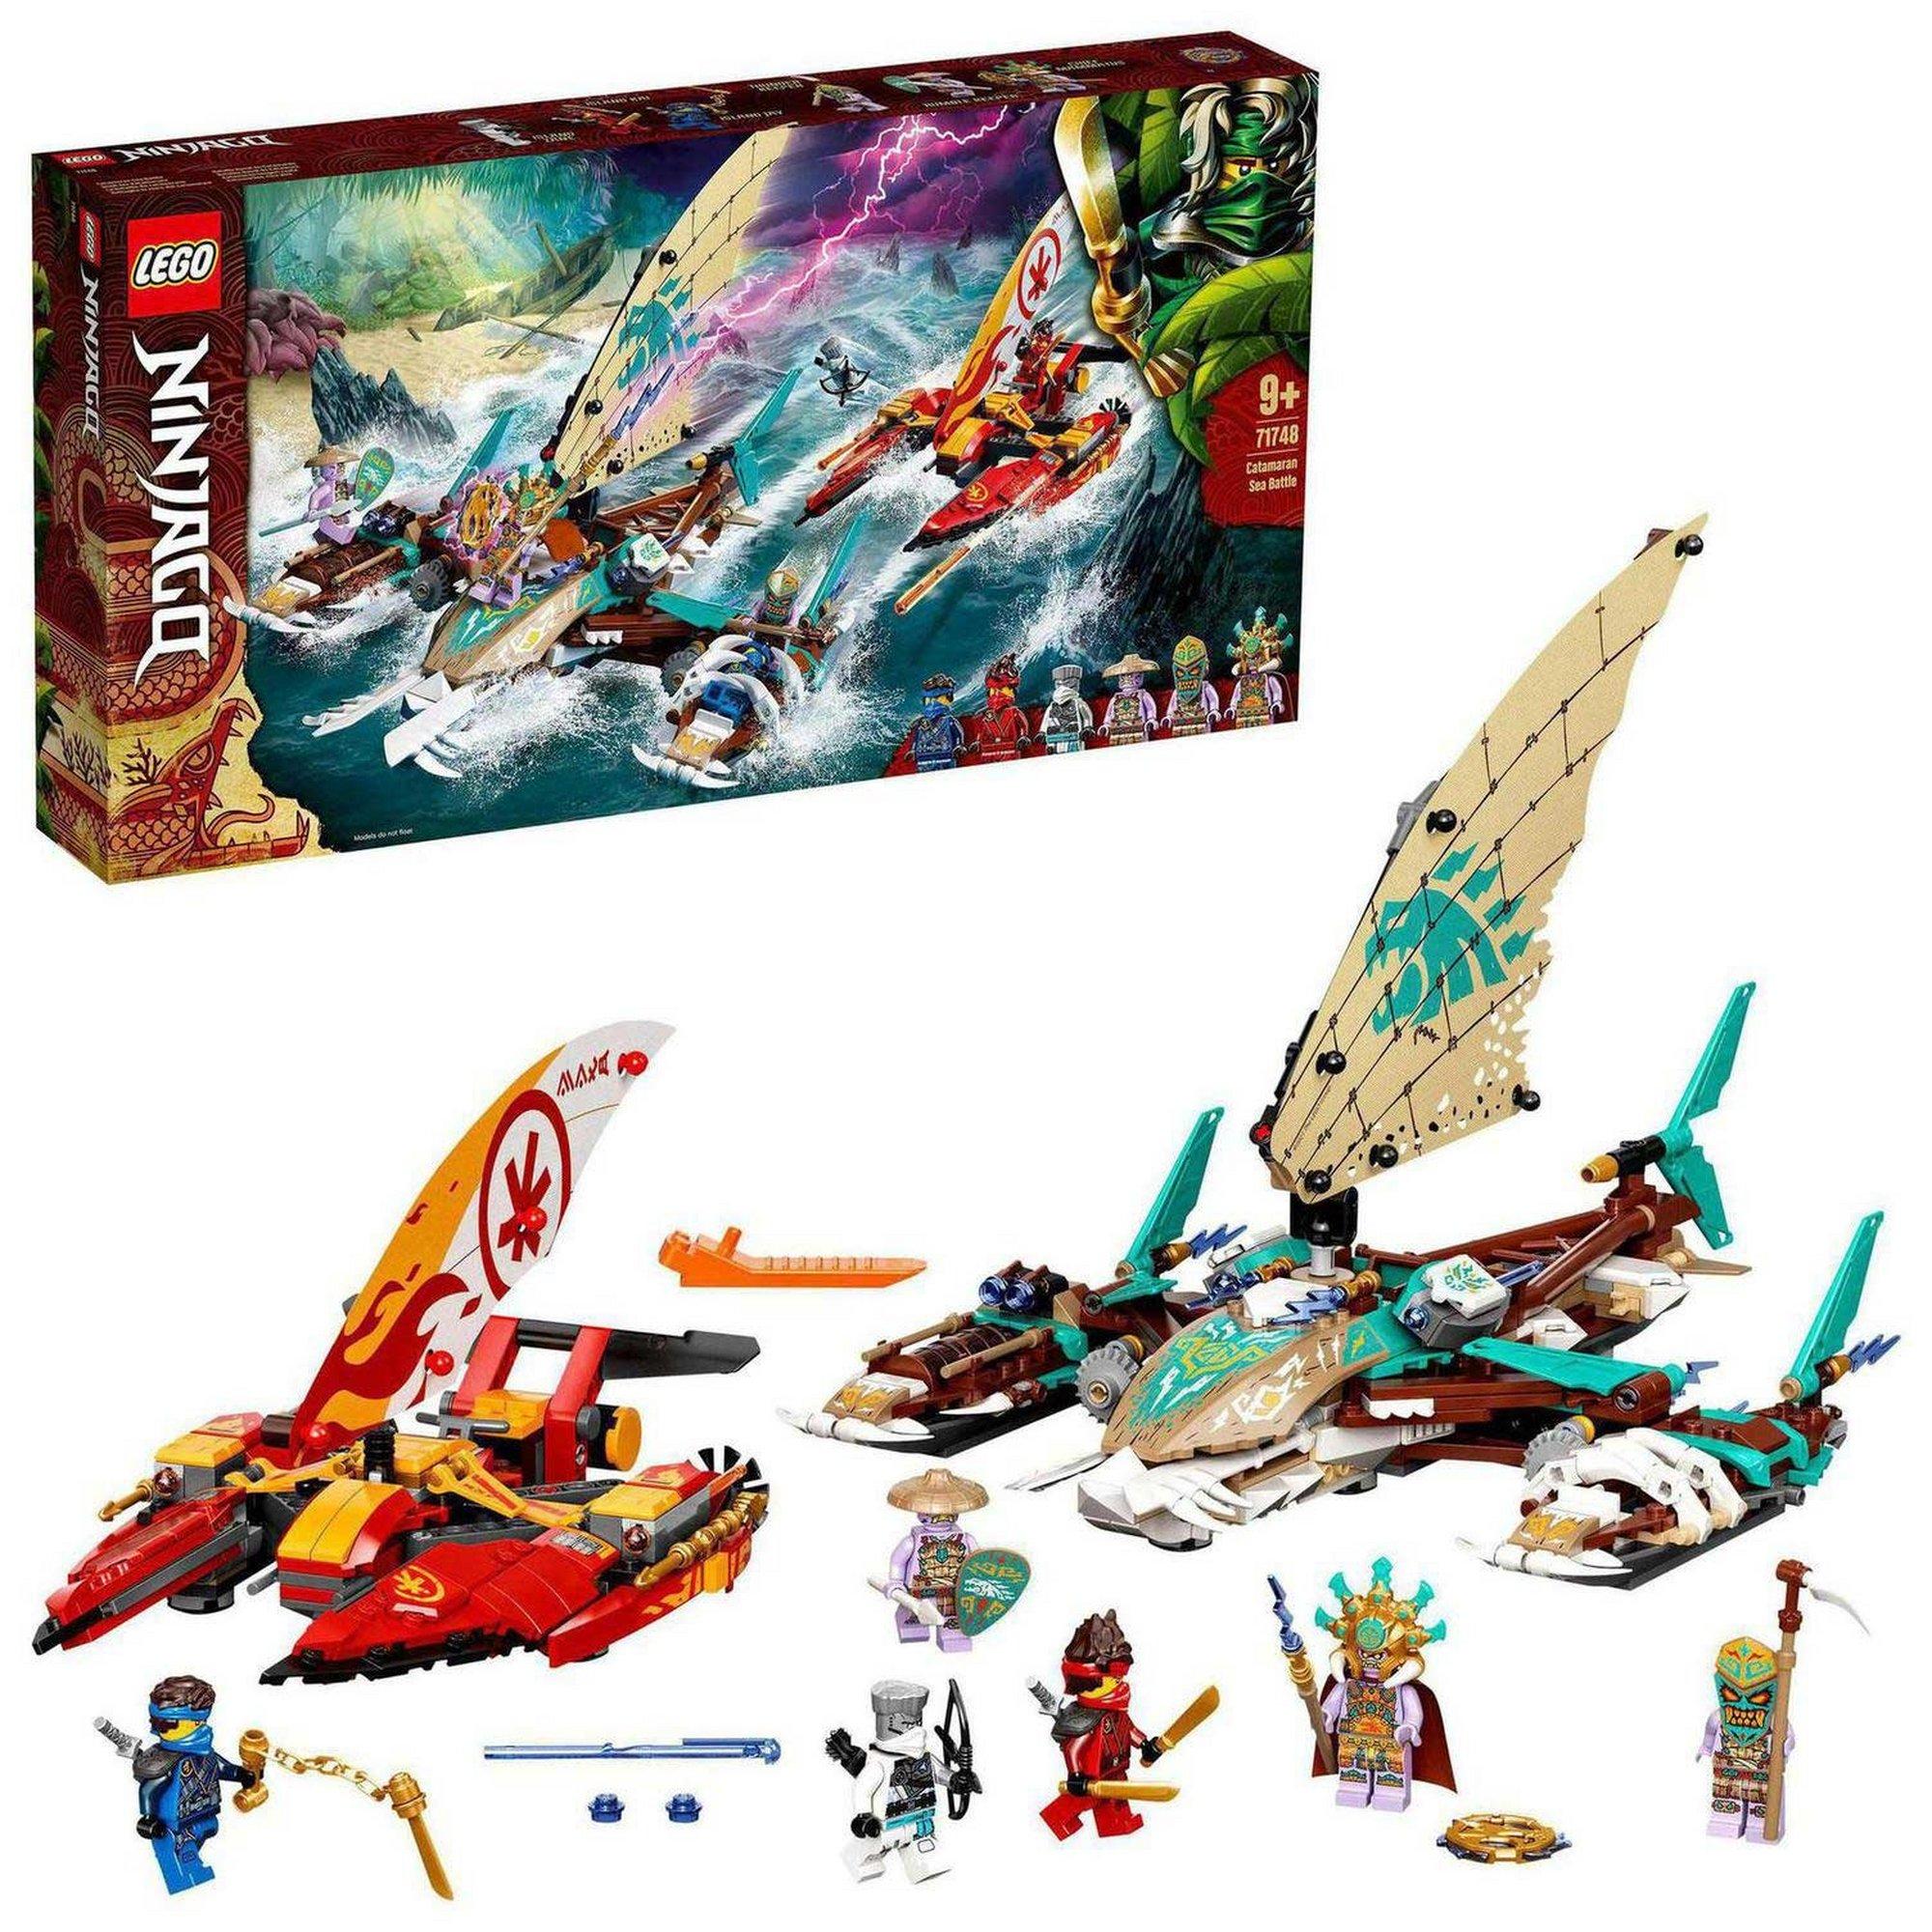 Image of LEGO Ninjago Catamaran Sea Battle Building Set